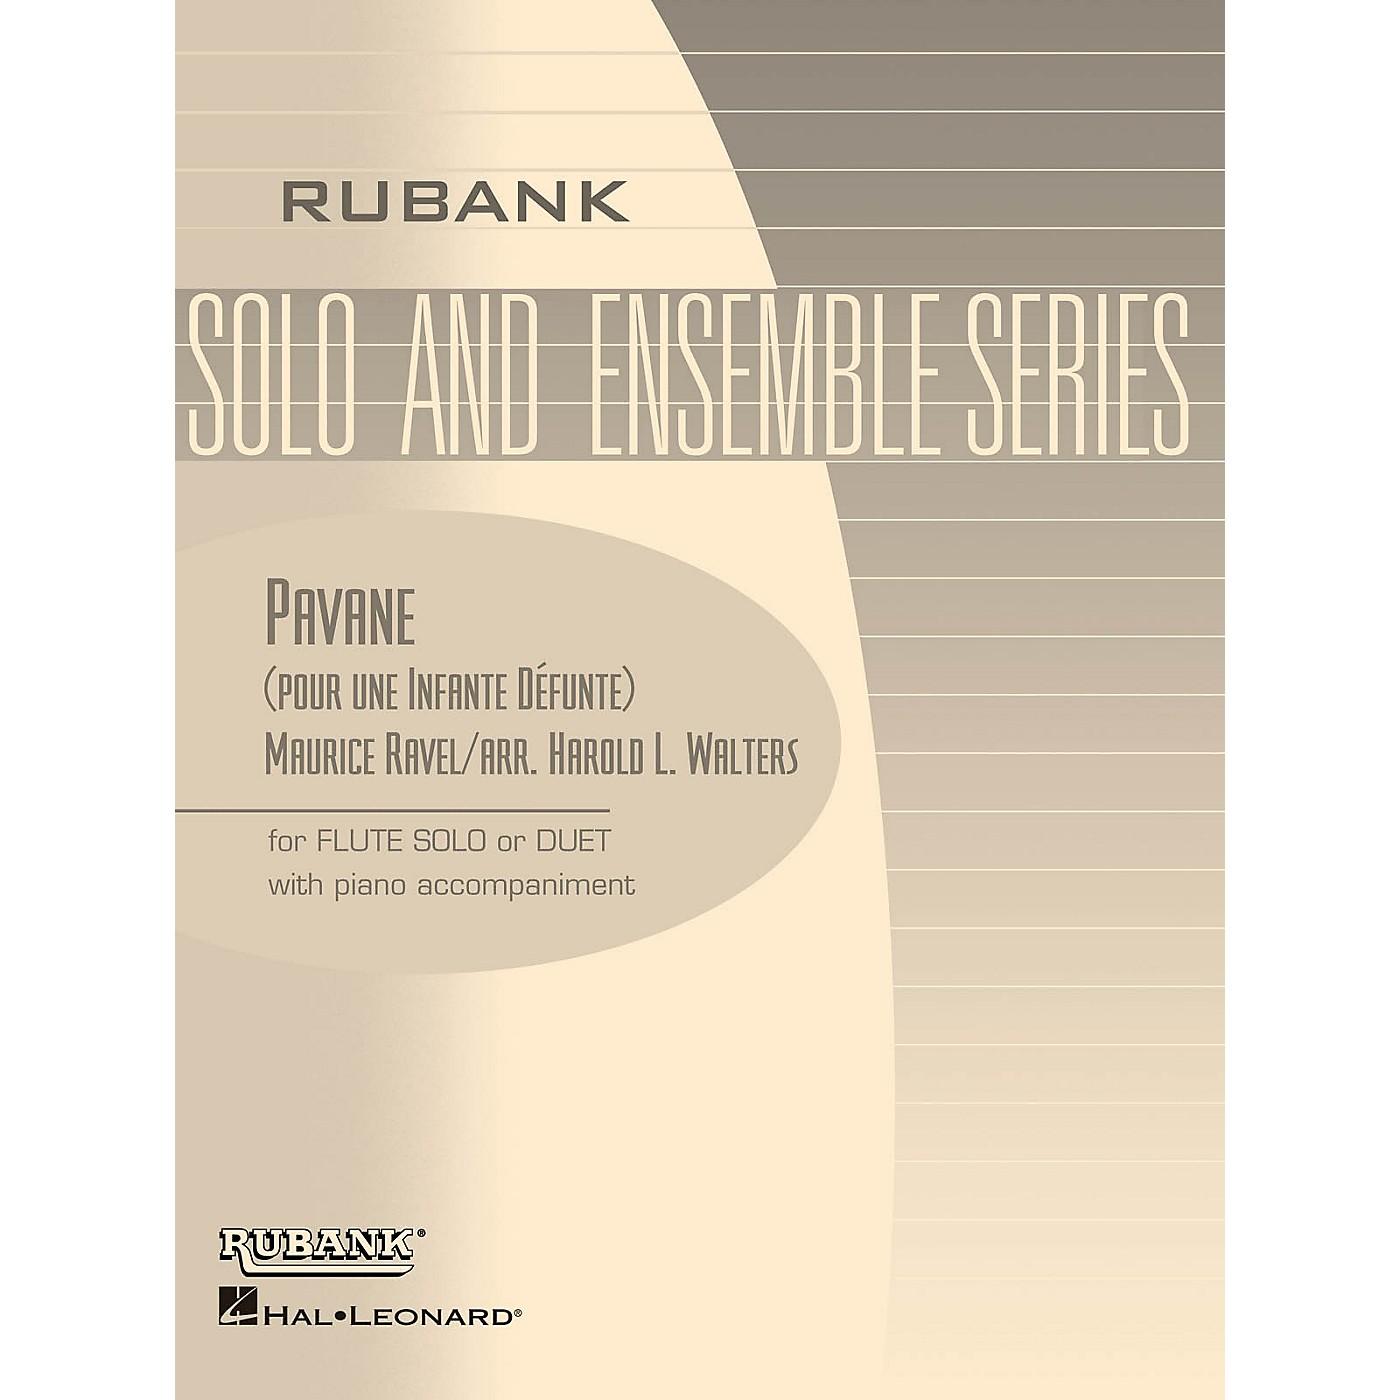 Rubank Publications Pavane (pour une Infante Défunte) Rubank Solo/Ensemble Sheet Series thumbnail